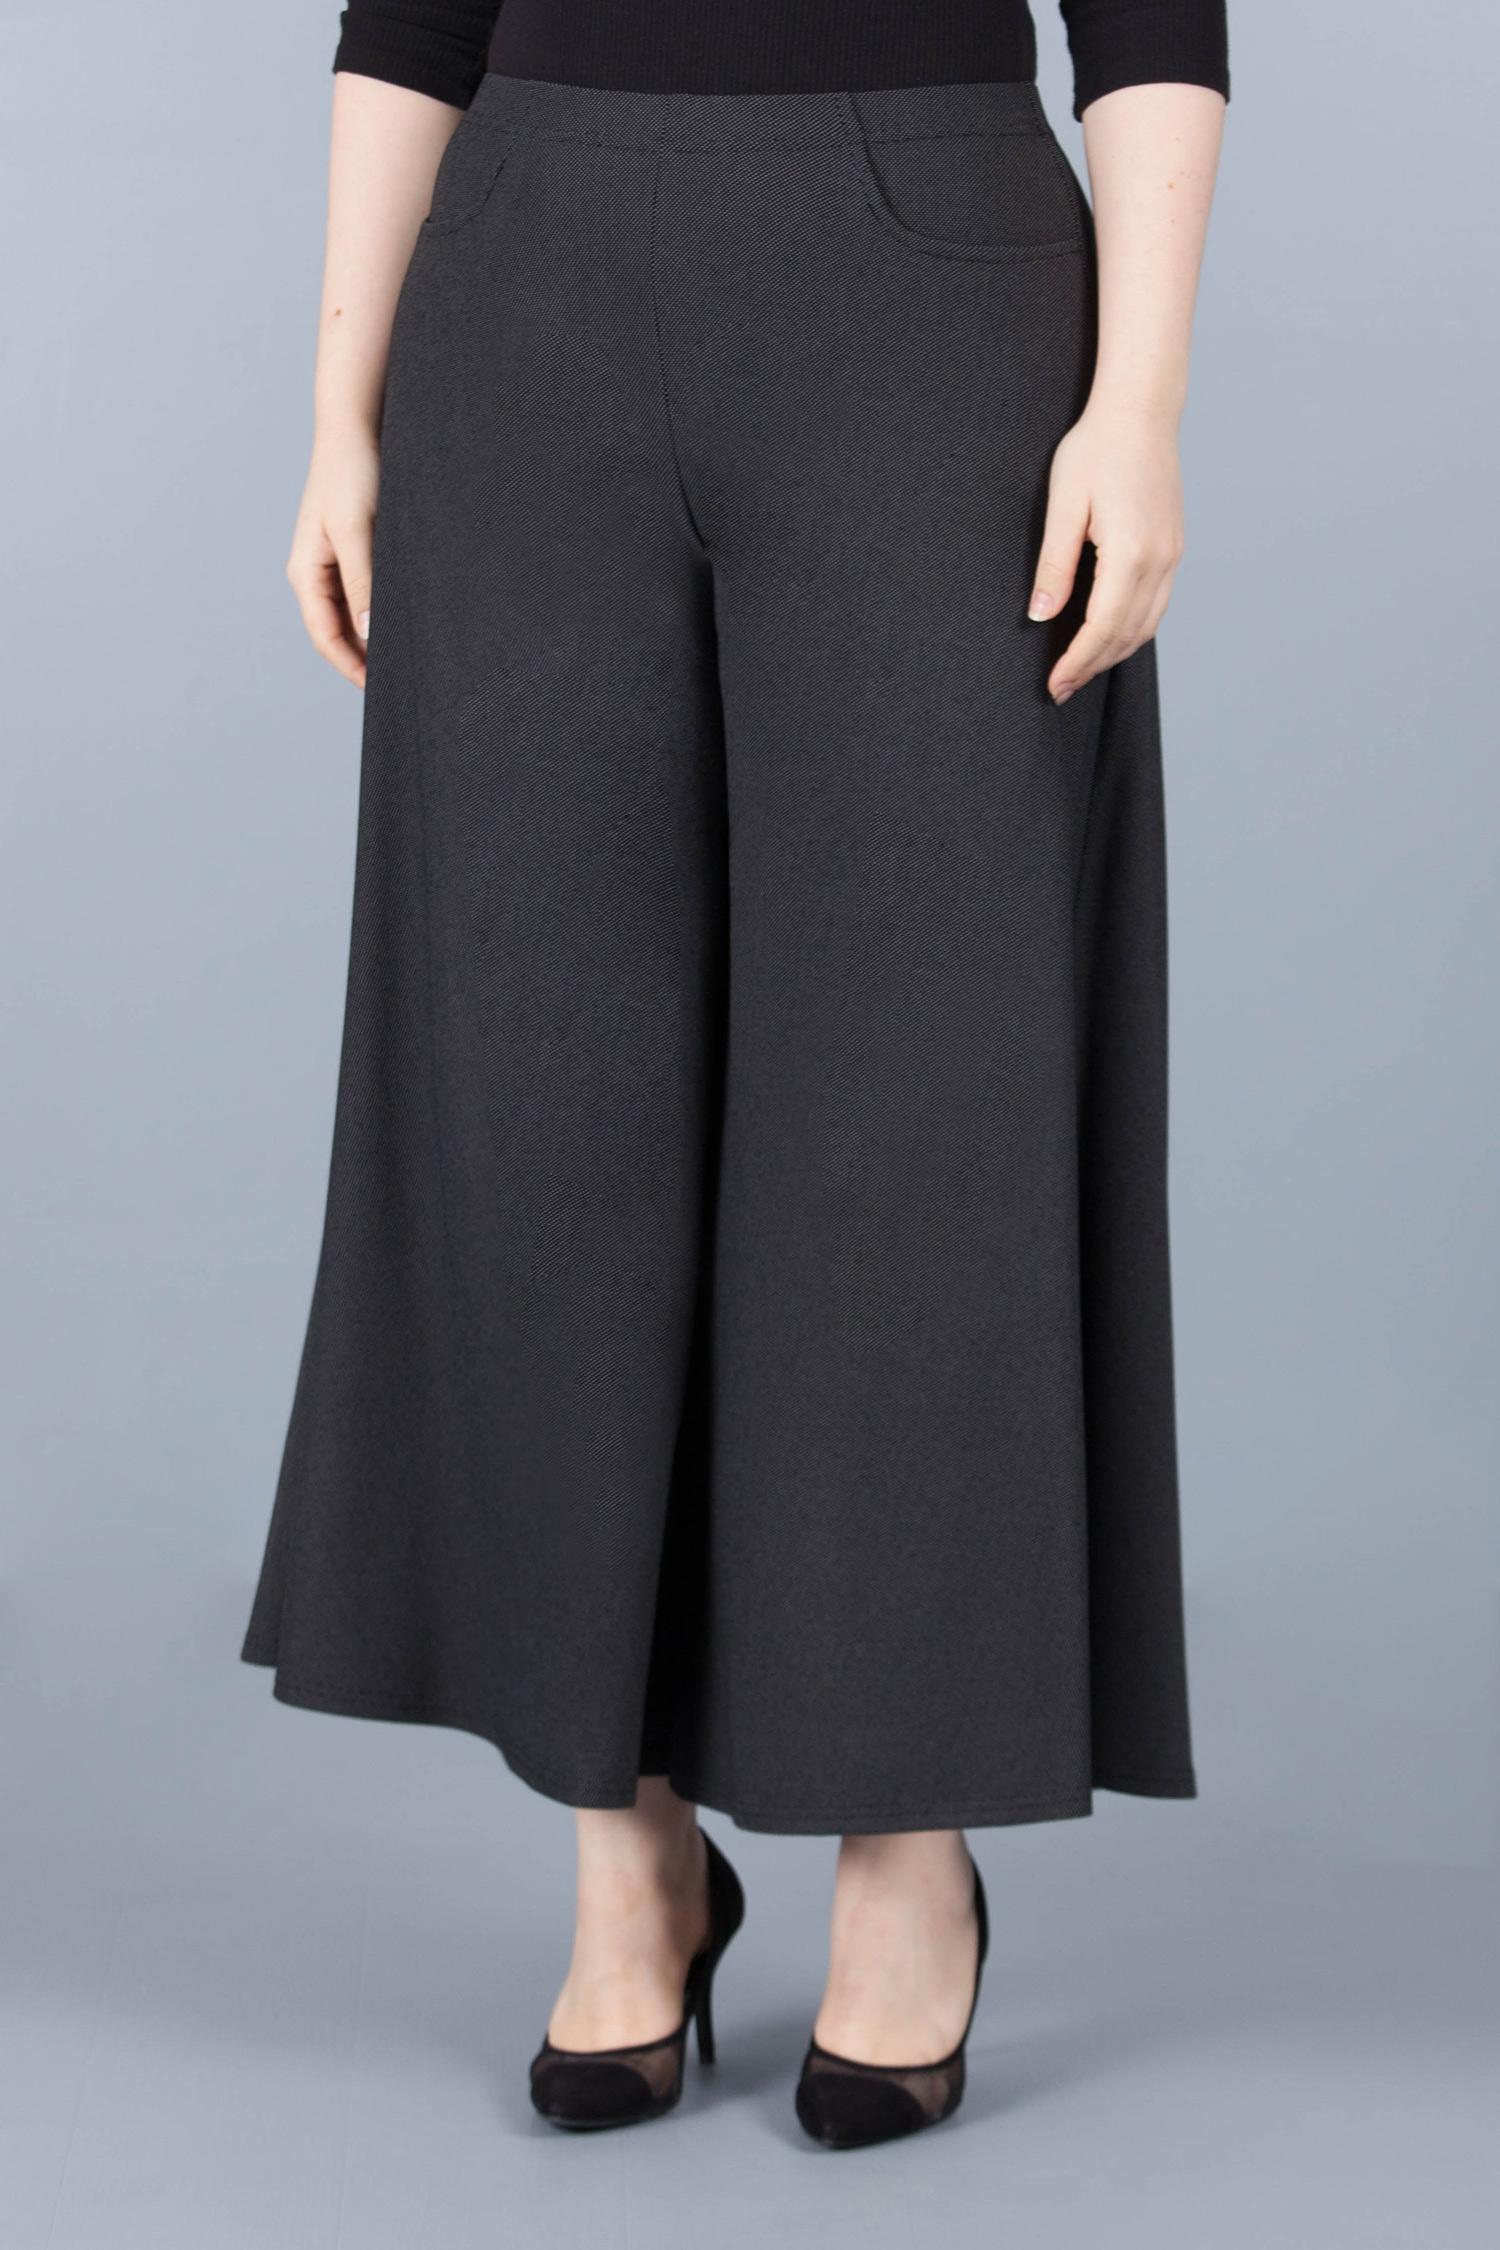 Pantalon jupe culotte - Noir